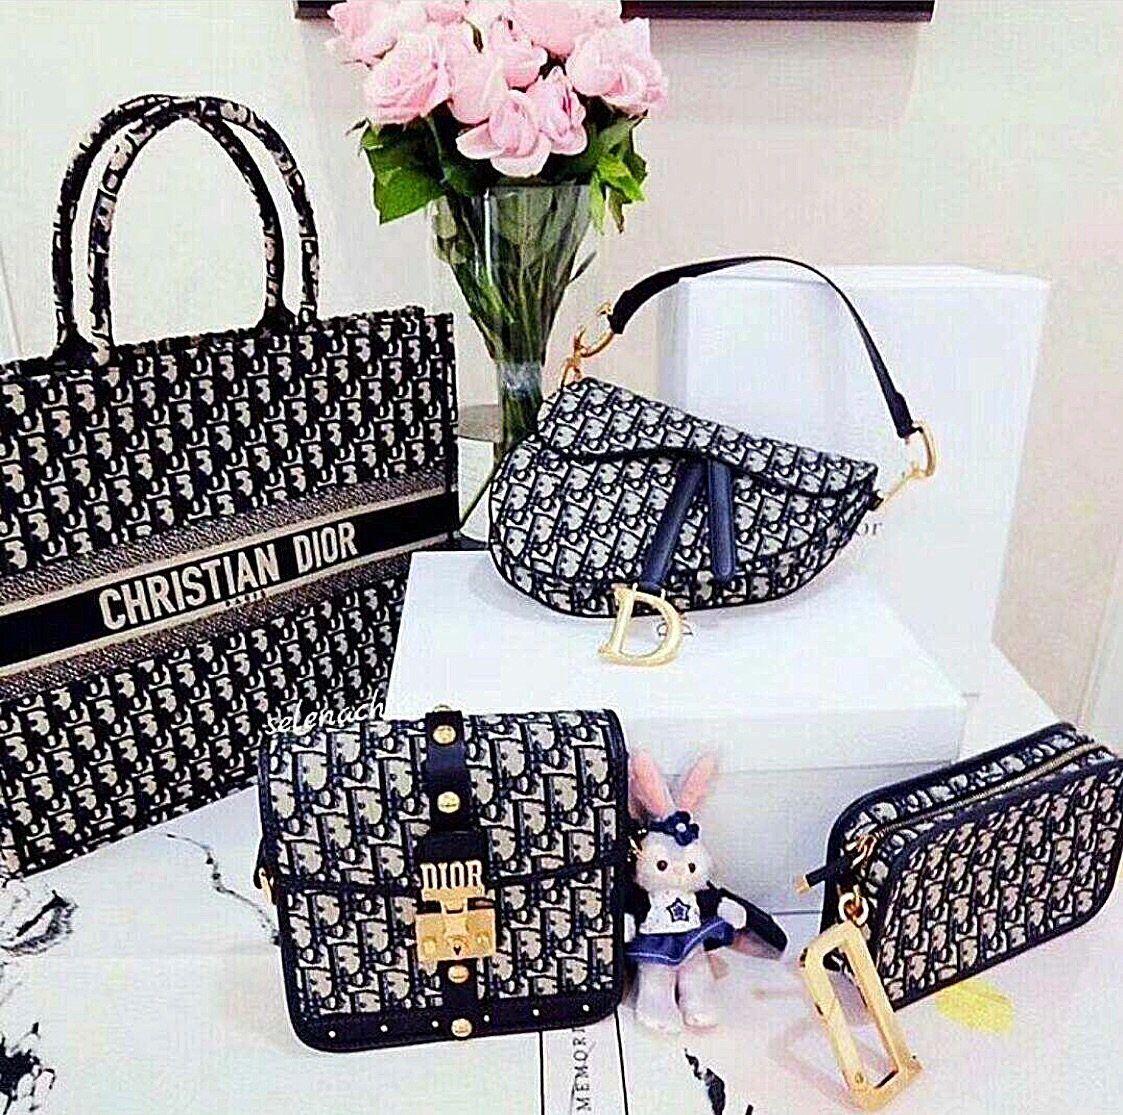 Dior Inspired Oblique Crossbody Bag Celebrity Inspiracion In 2020 Christian Dior Bags Dior Purses Luxury Purses